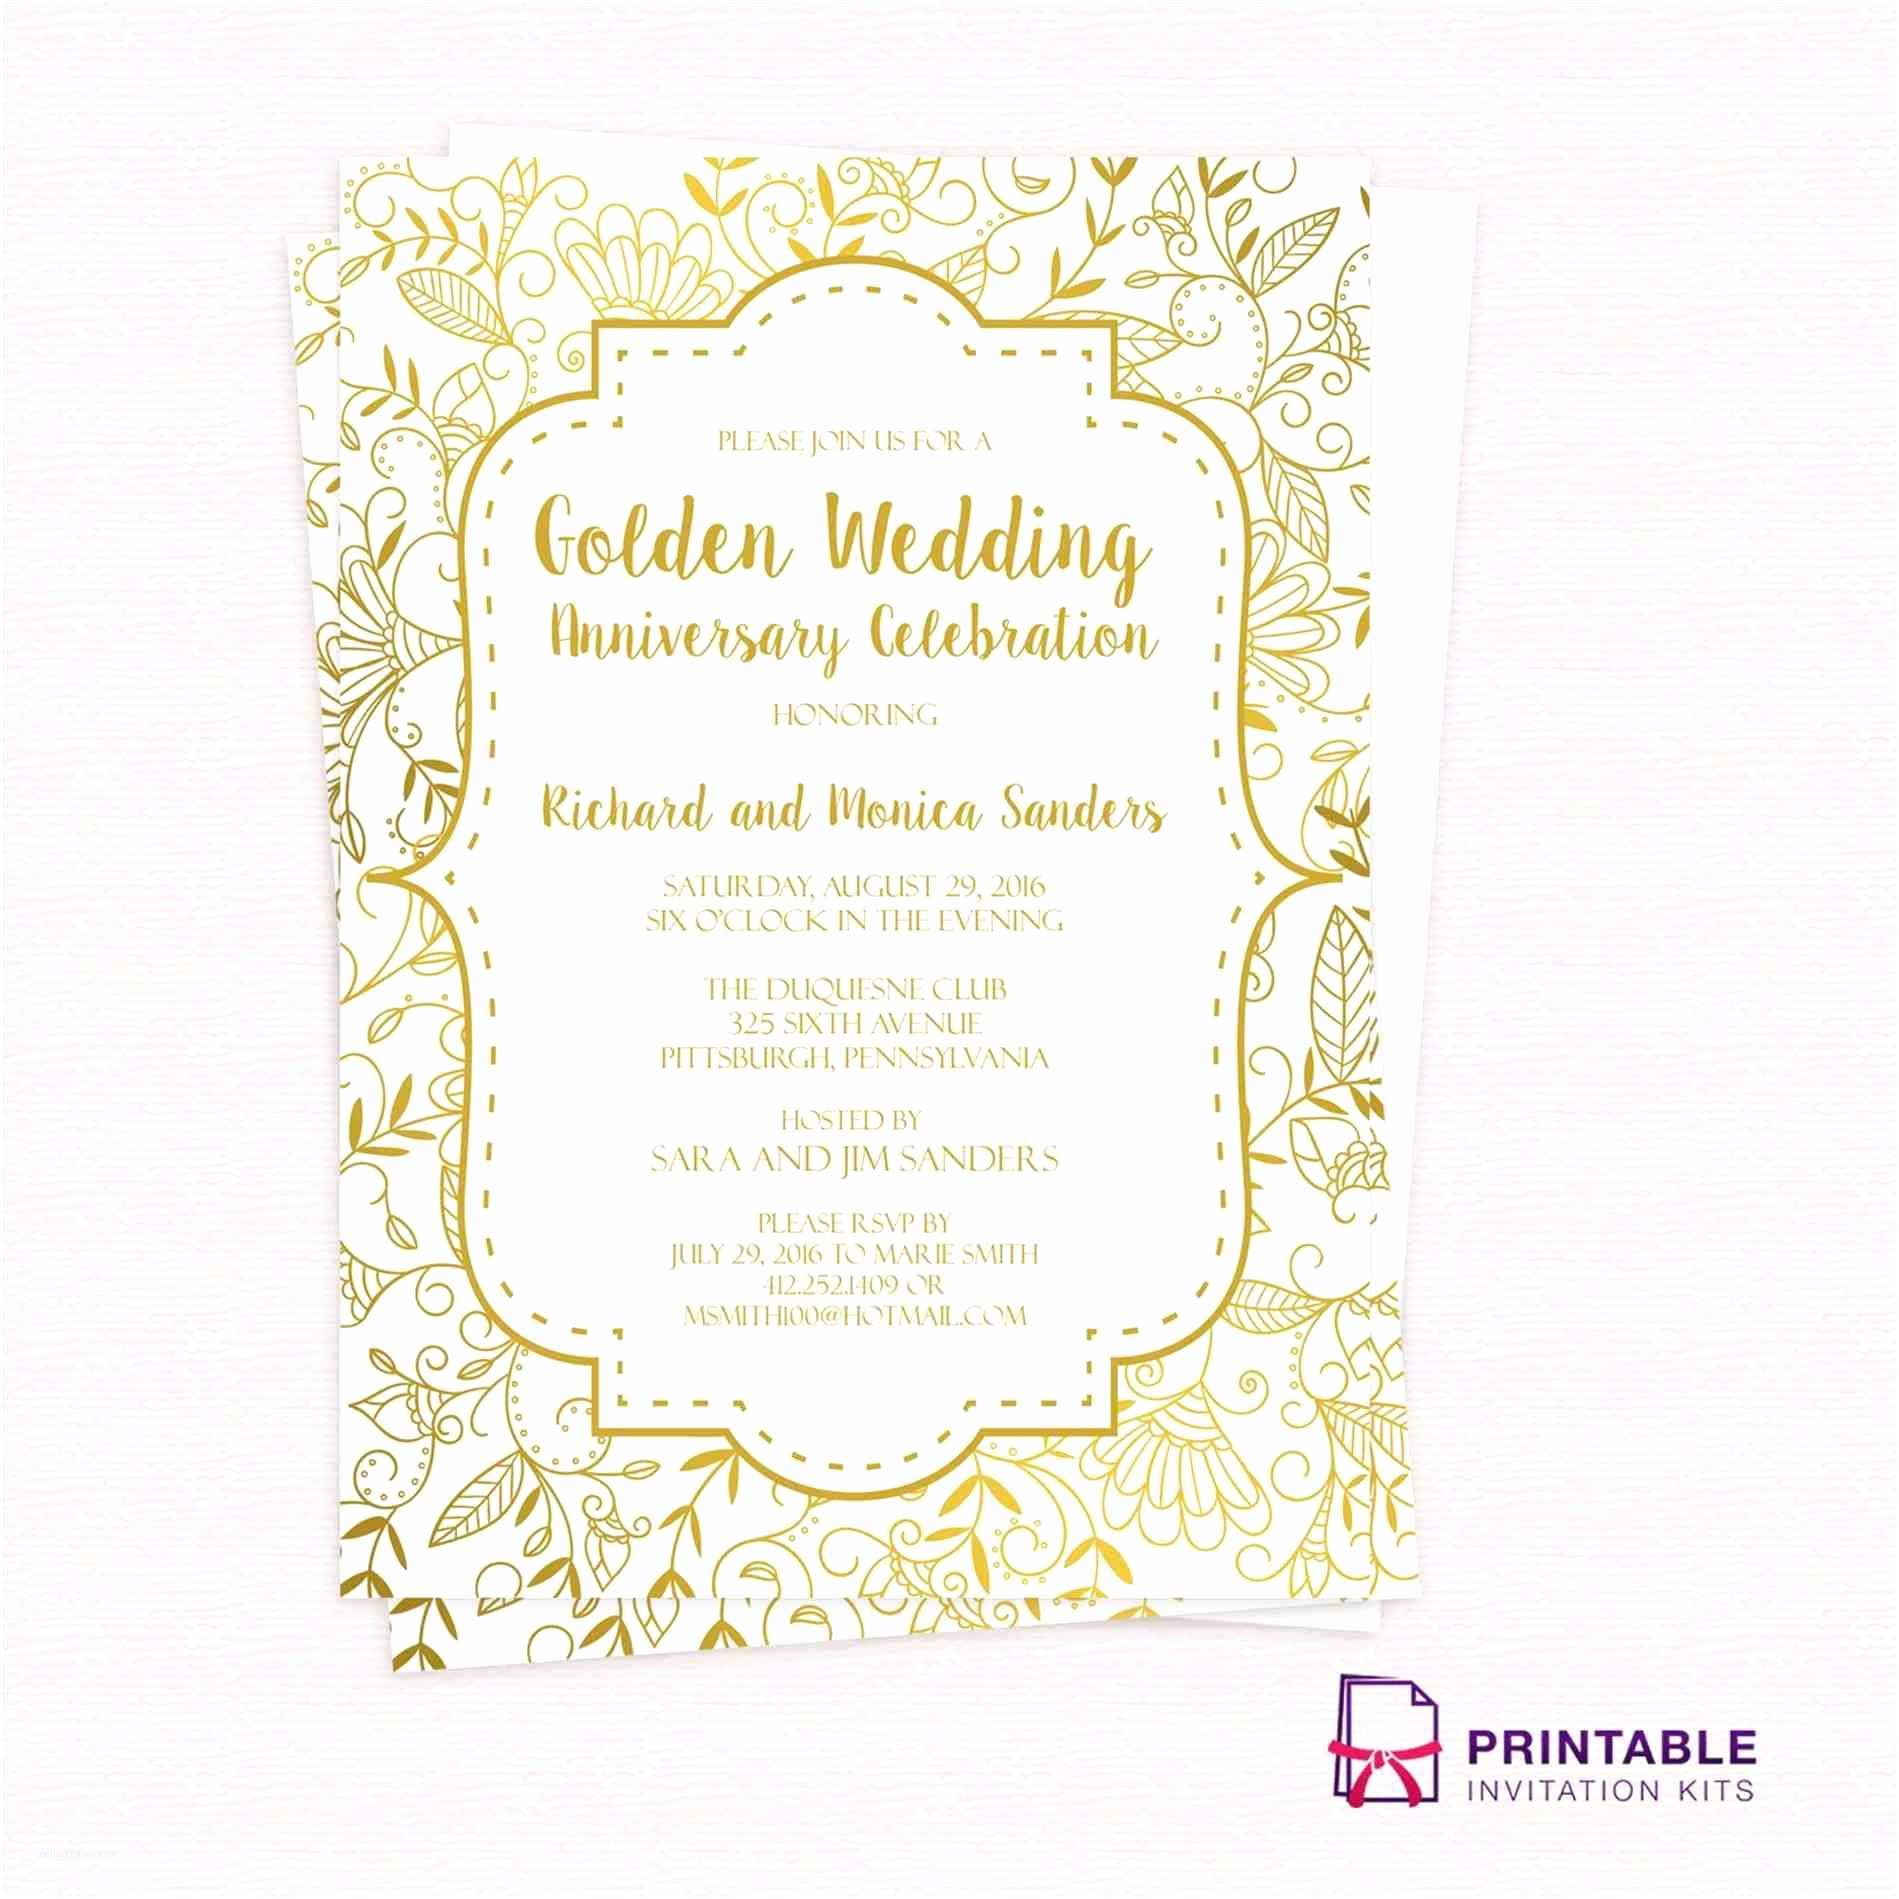 Wedding Invitation With Photo Templates Blank Wedding Invitations Templates